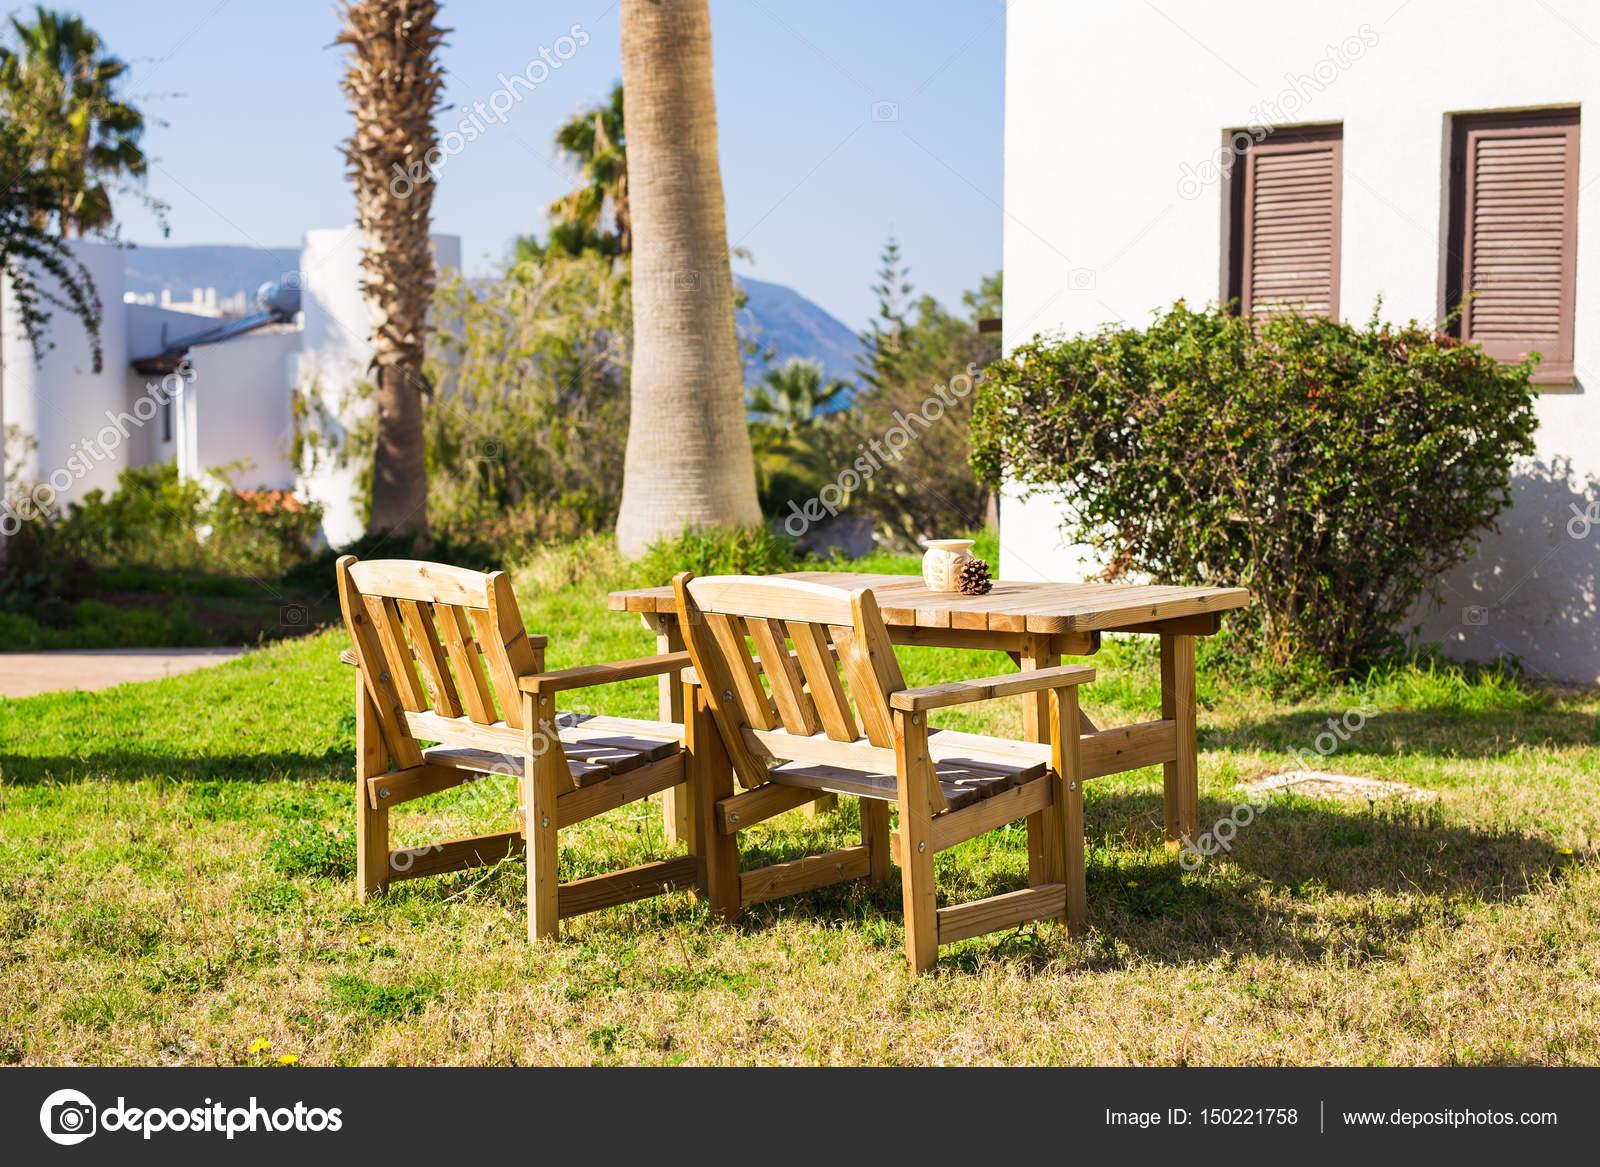 Tuin Lounge Stoel : Tuinmeubilair lounge stoelen in de tuin van het hotel nodigen u